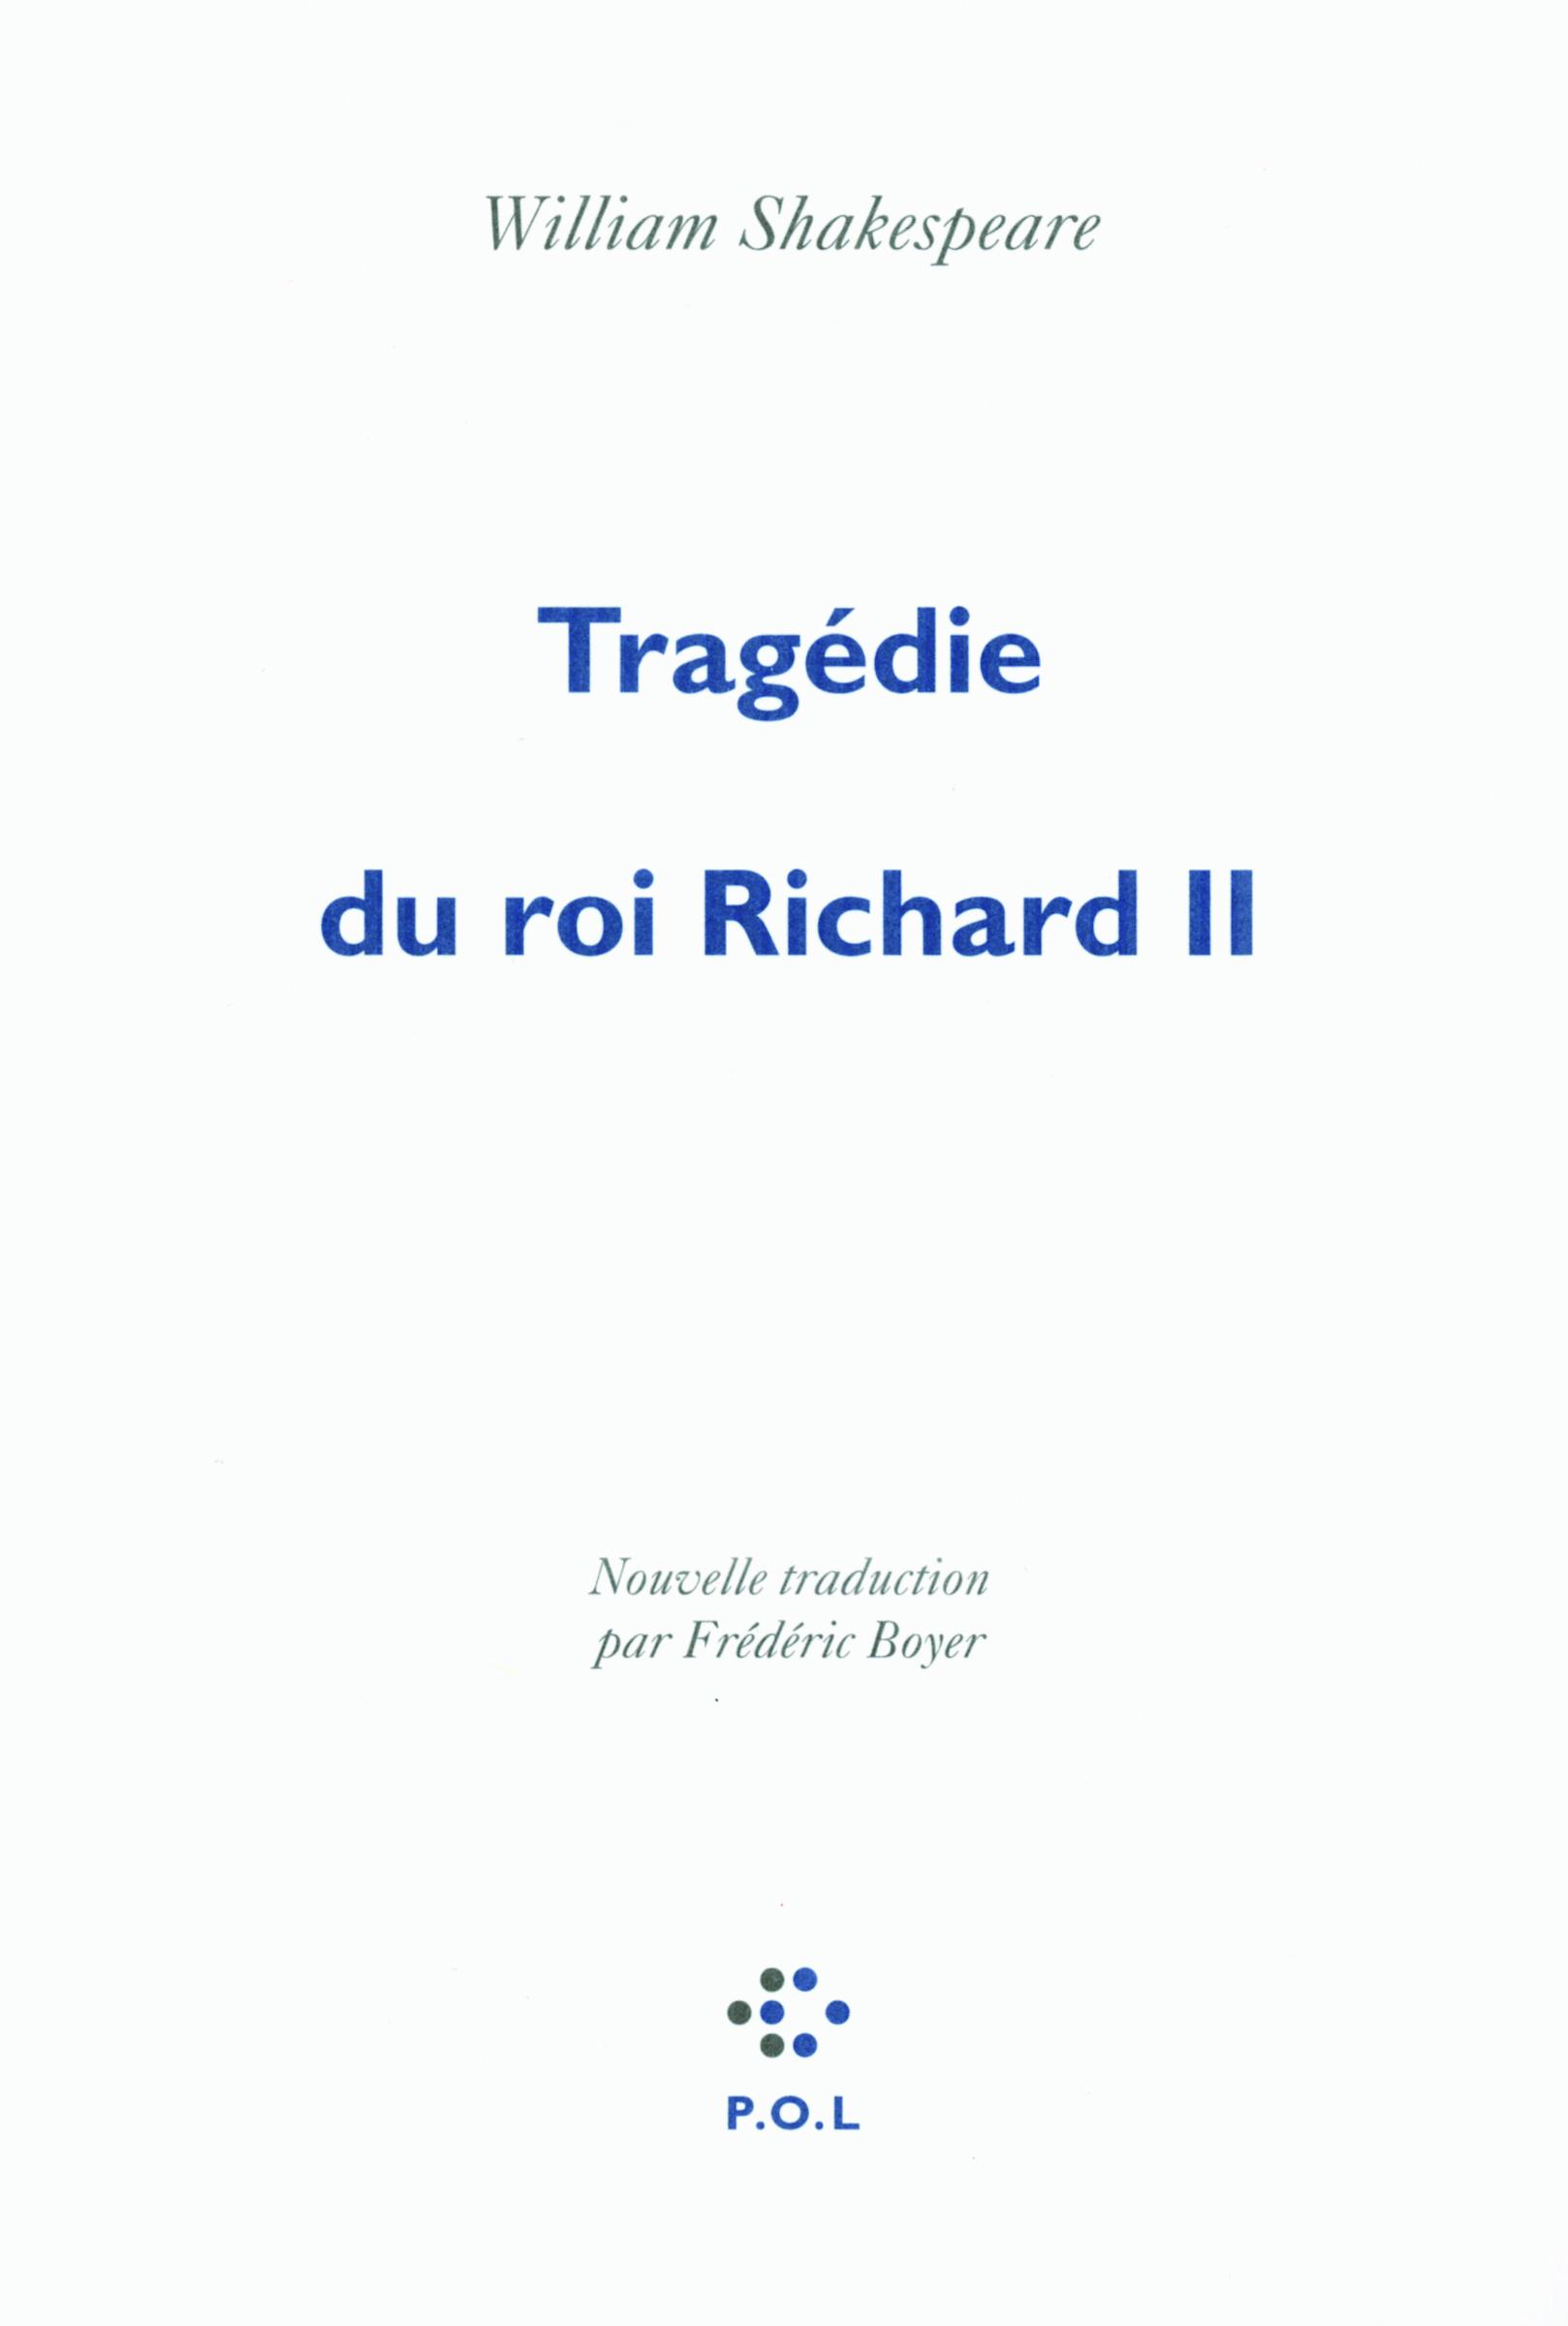 TRAGEDIE DU ROI RICHARD II